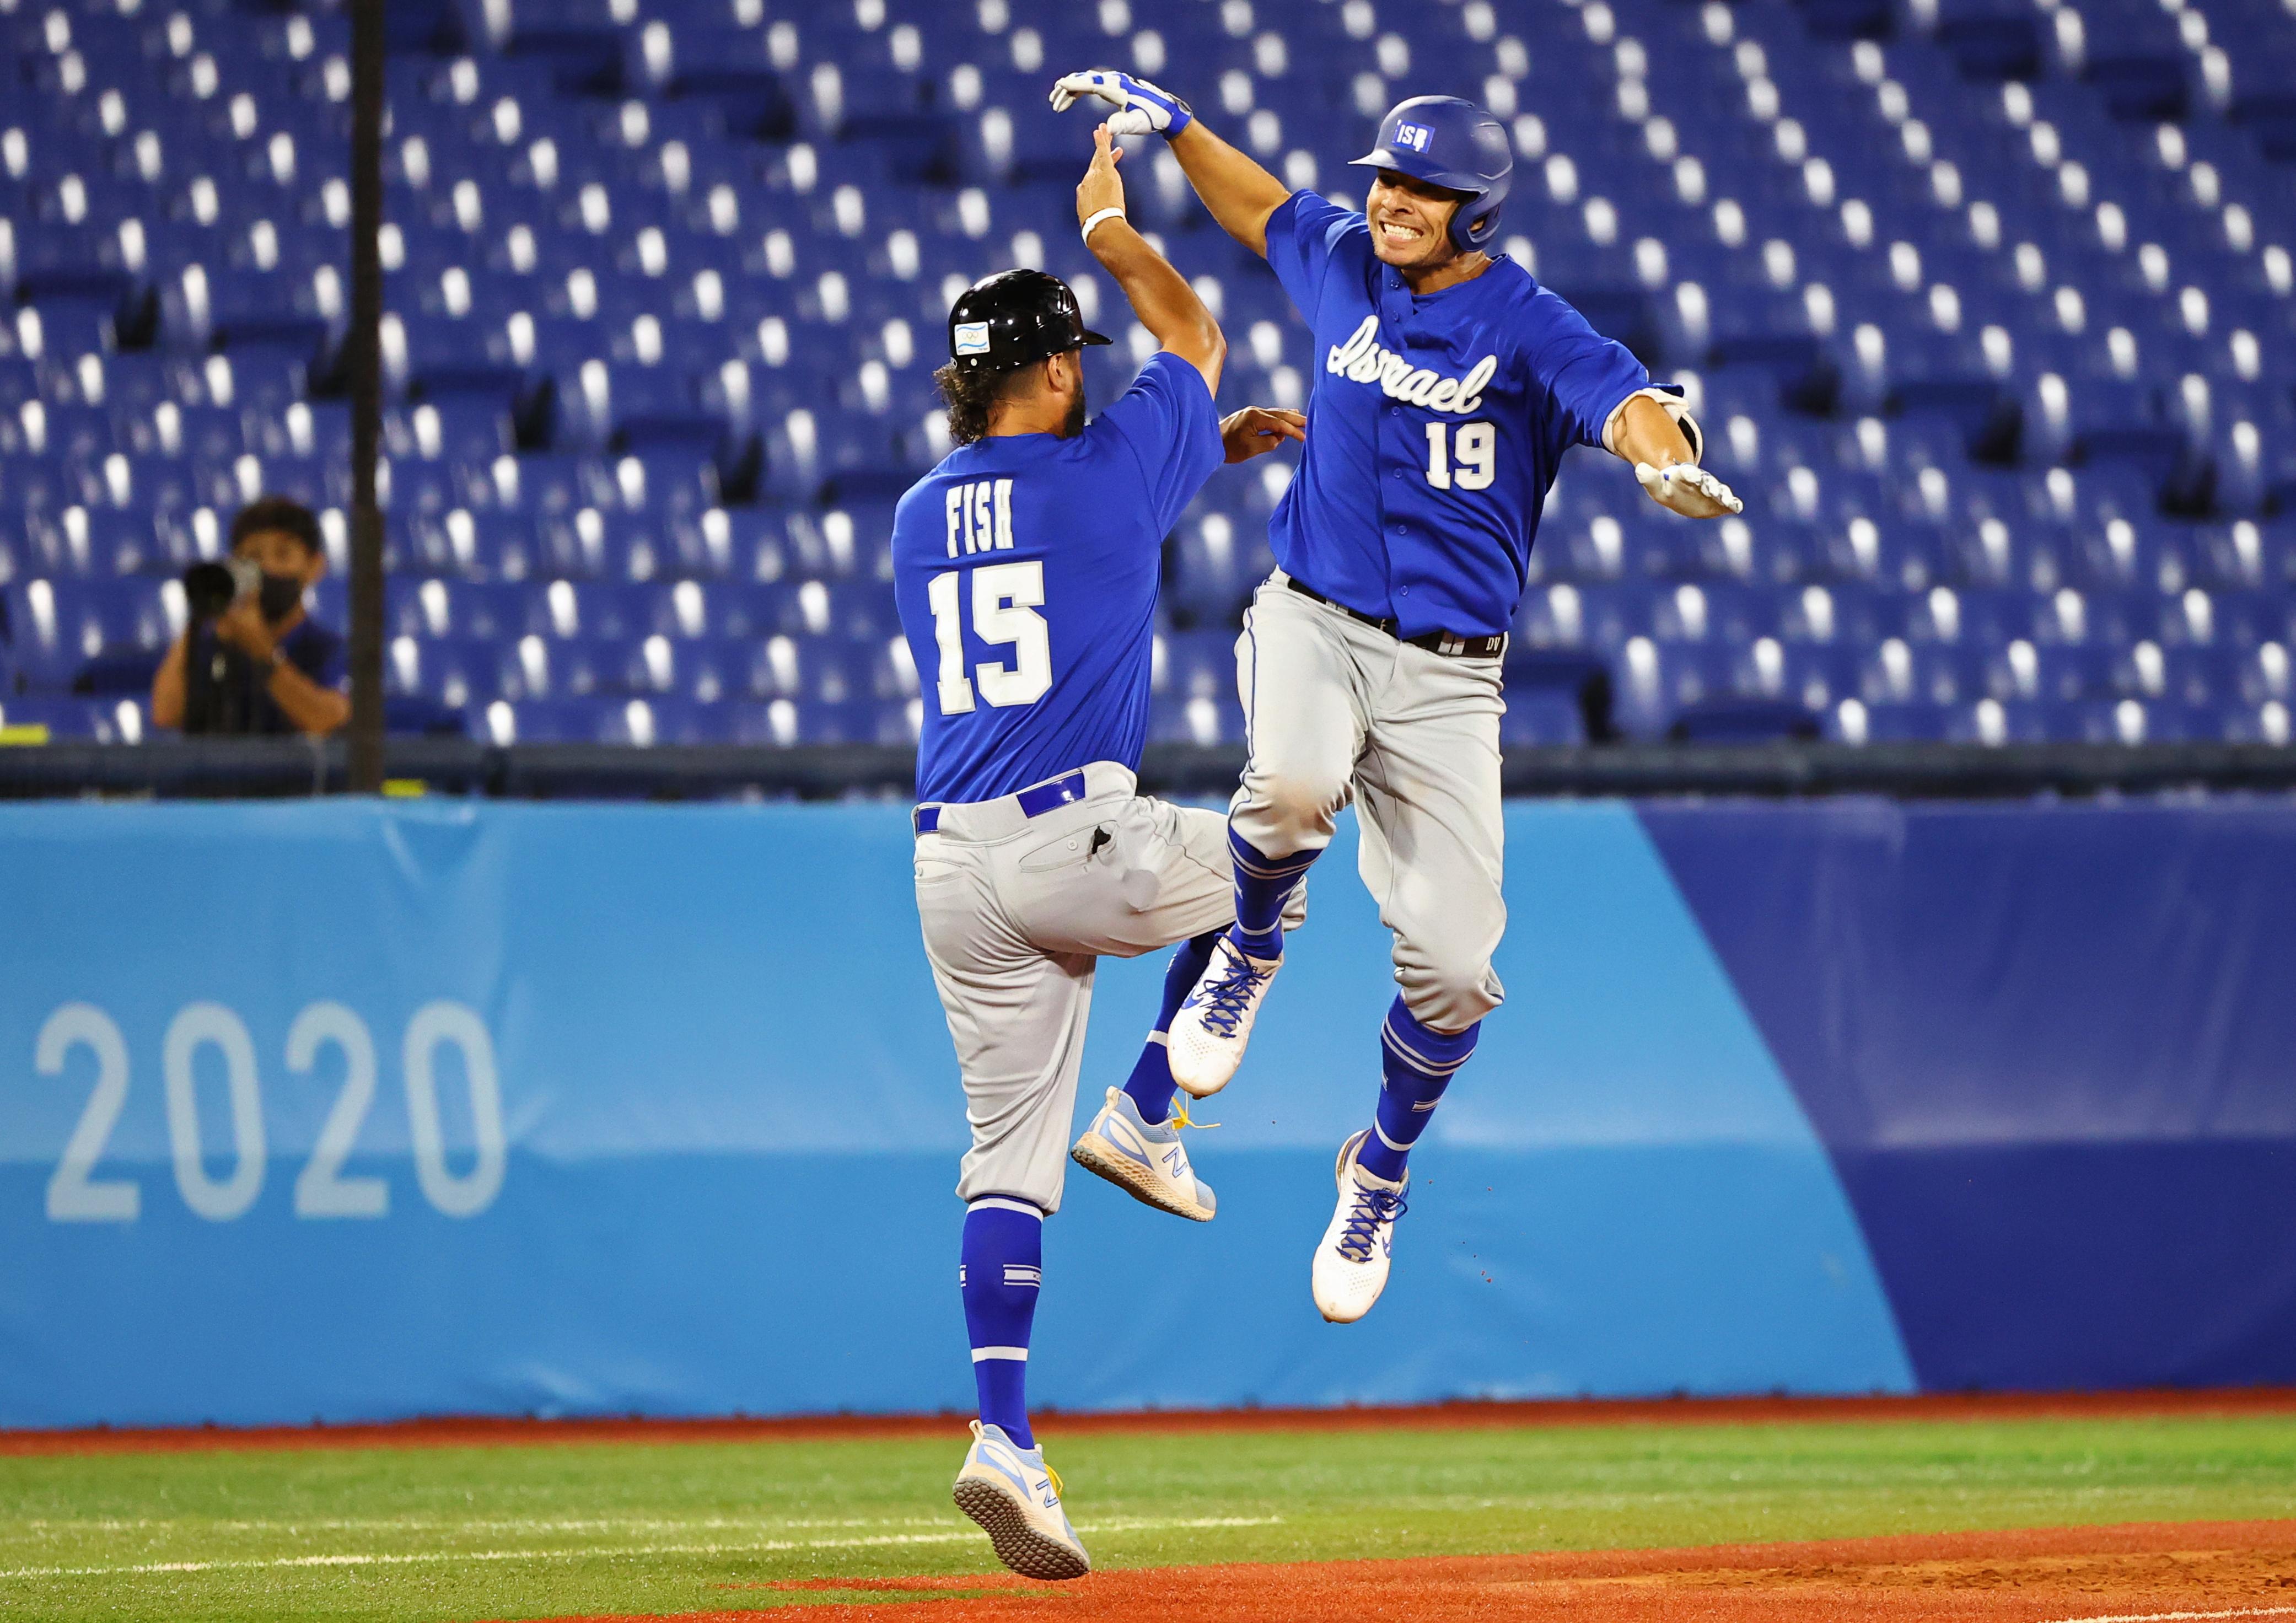 Tokyo 2020 Olympics - Baseball - Men - Round 1 Repechage - Israel v Dominican Republic - Yokohama Baseball Stadium, Yokohama, Japan - August 3, 2021. Danny Valencia of Israel celebrates home run with coach Nate Fish. REUTERS/Jorge Silva